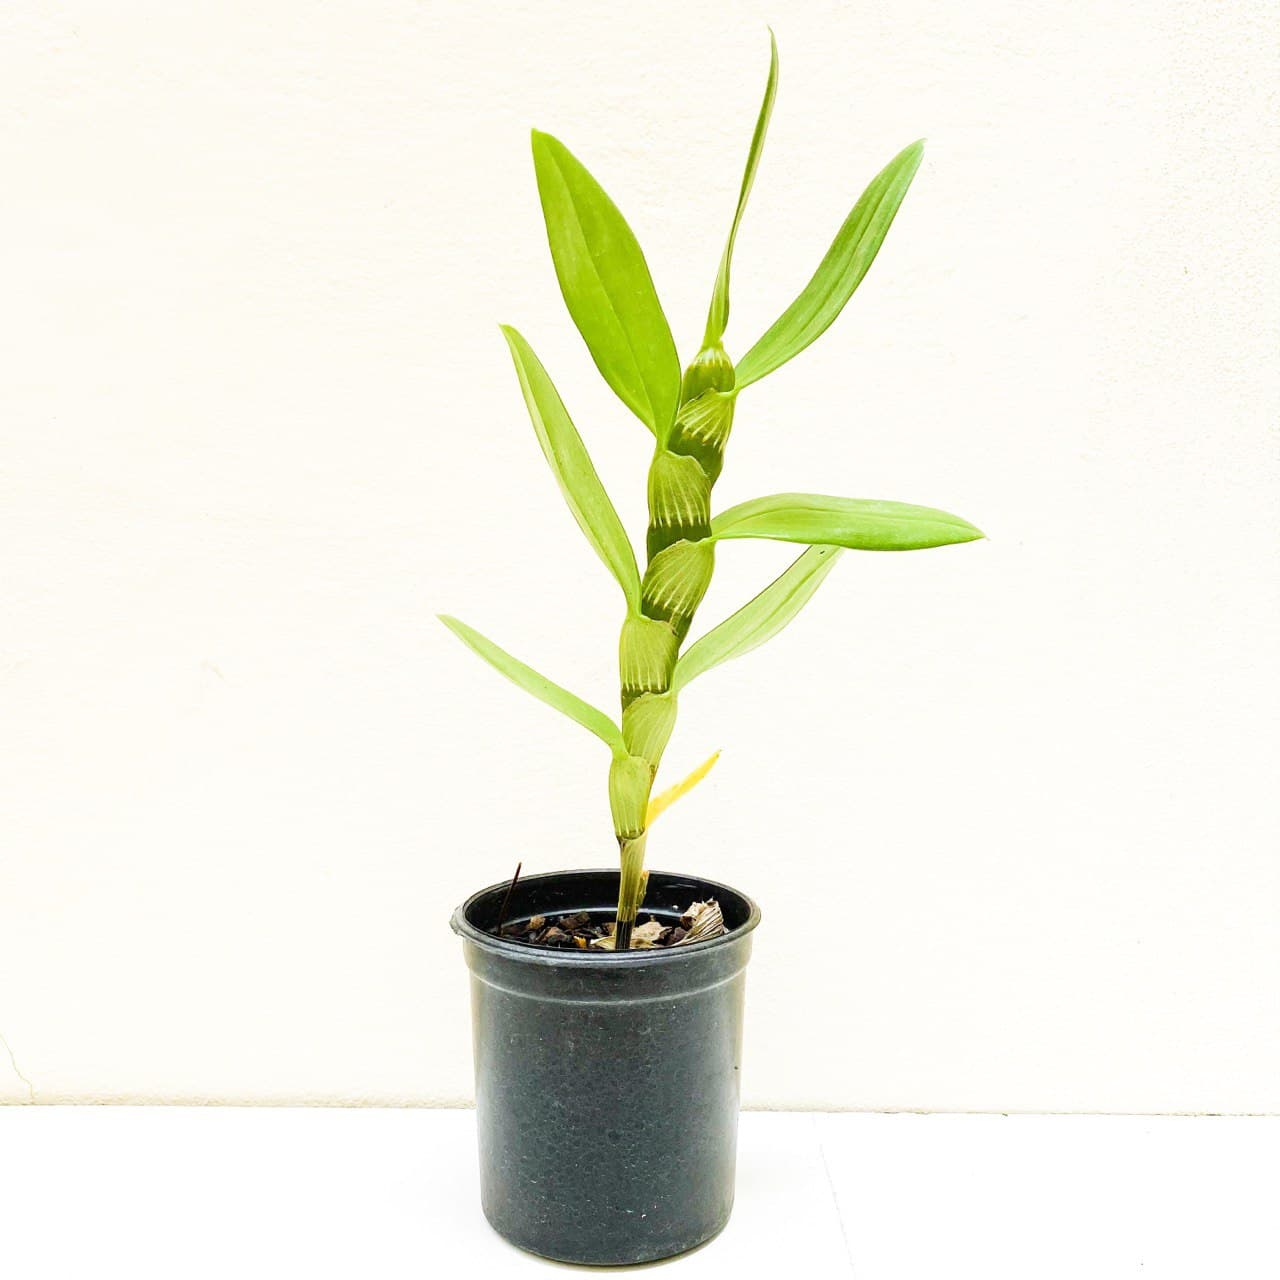 Kit 10 mudas Orquídeas Dendrobium Adultas  - ORQUIDEA GARDEN